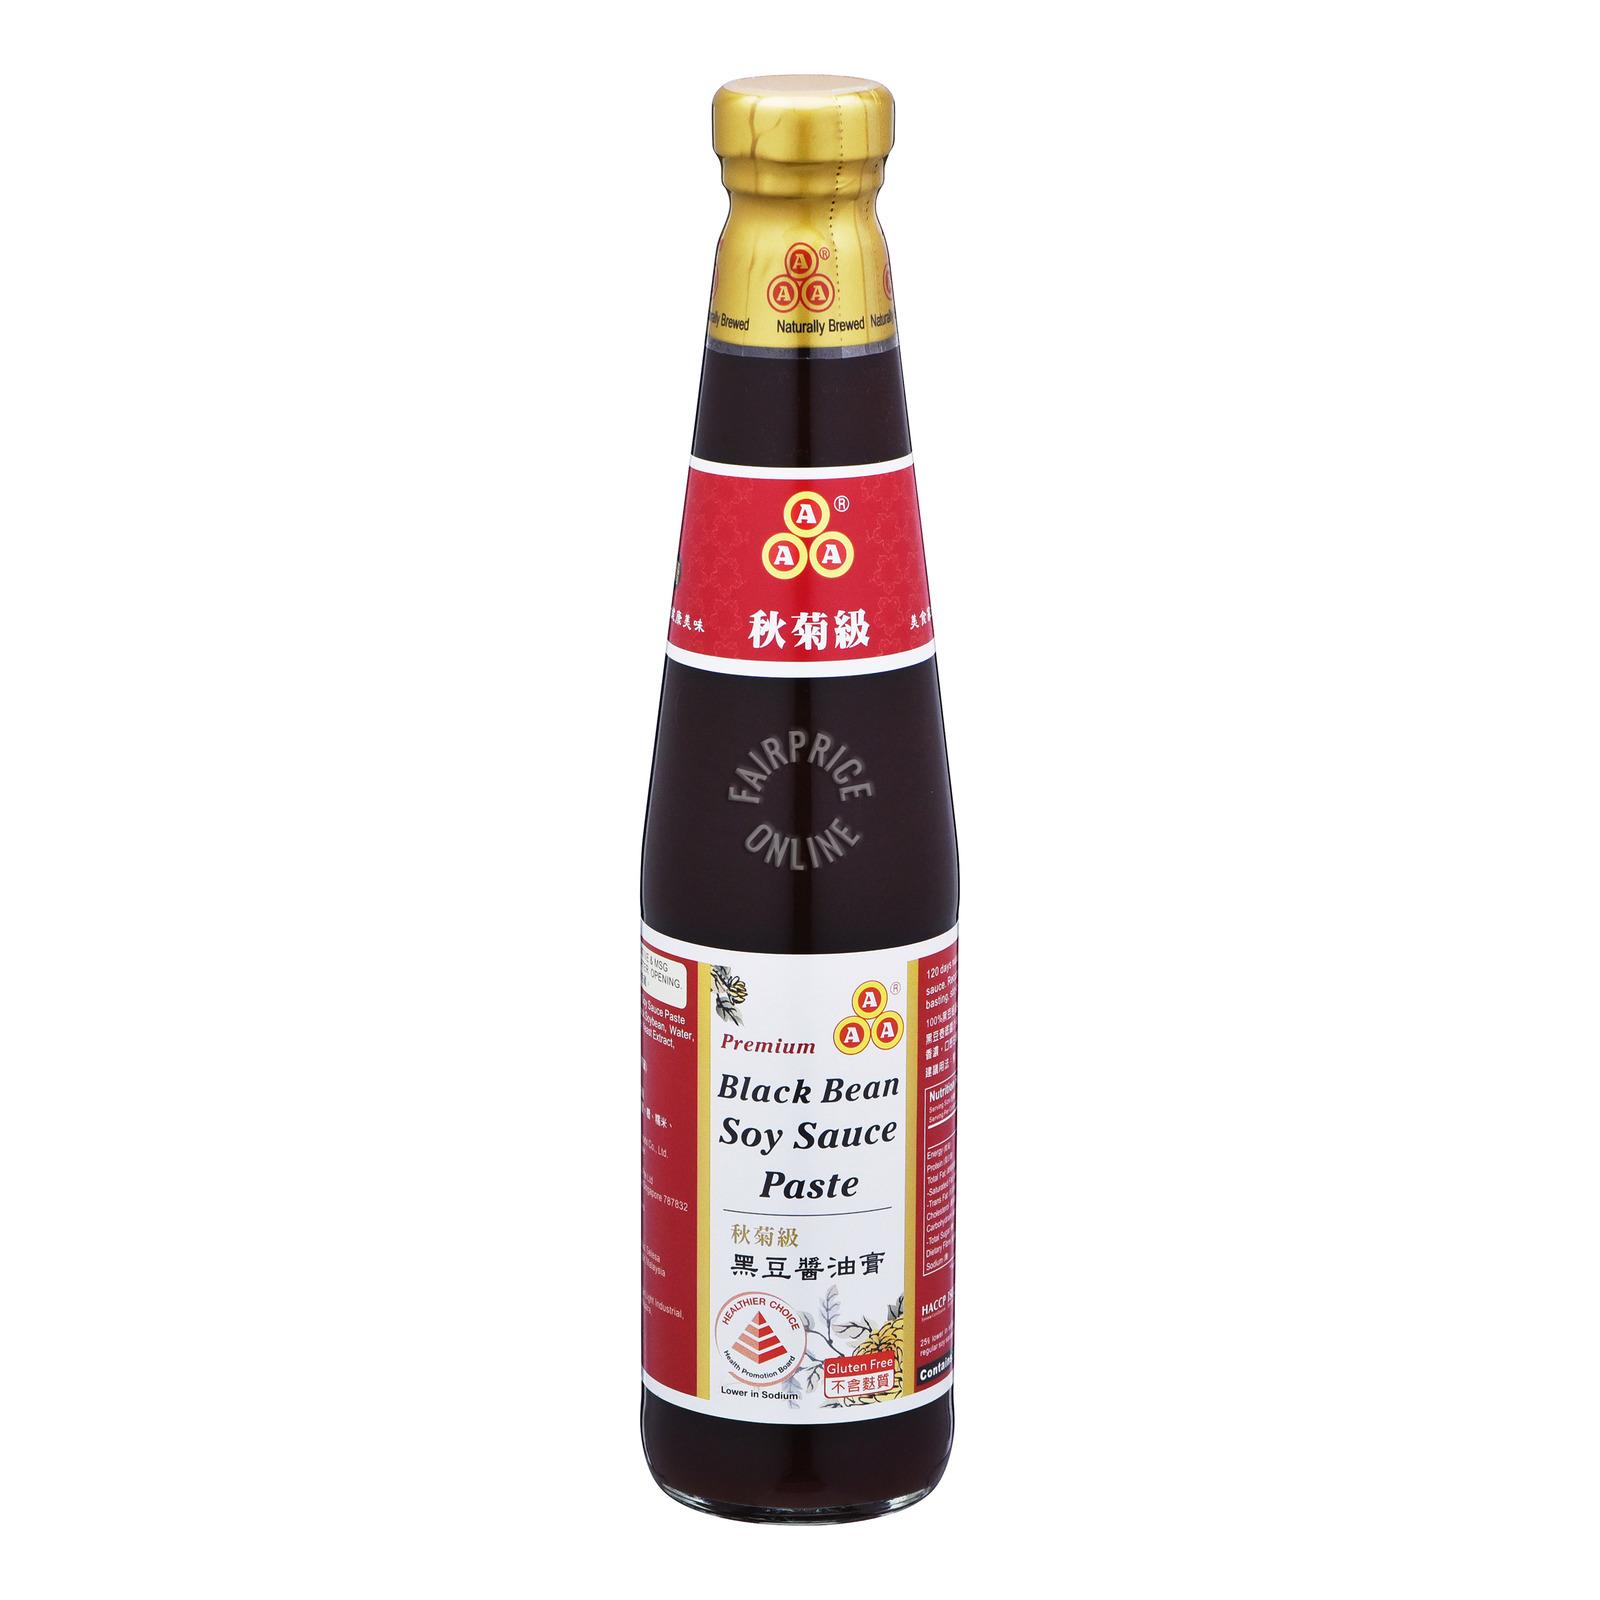 AAA Premium Black Bean Soy Sauce Paste